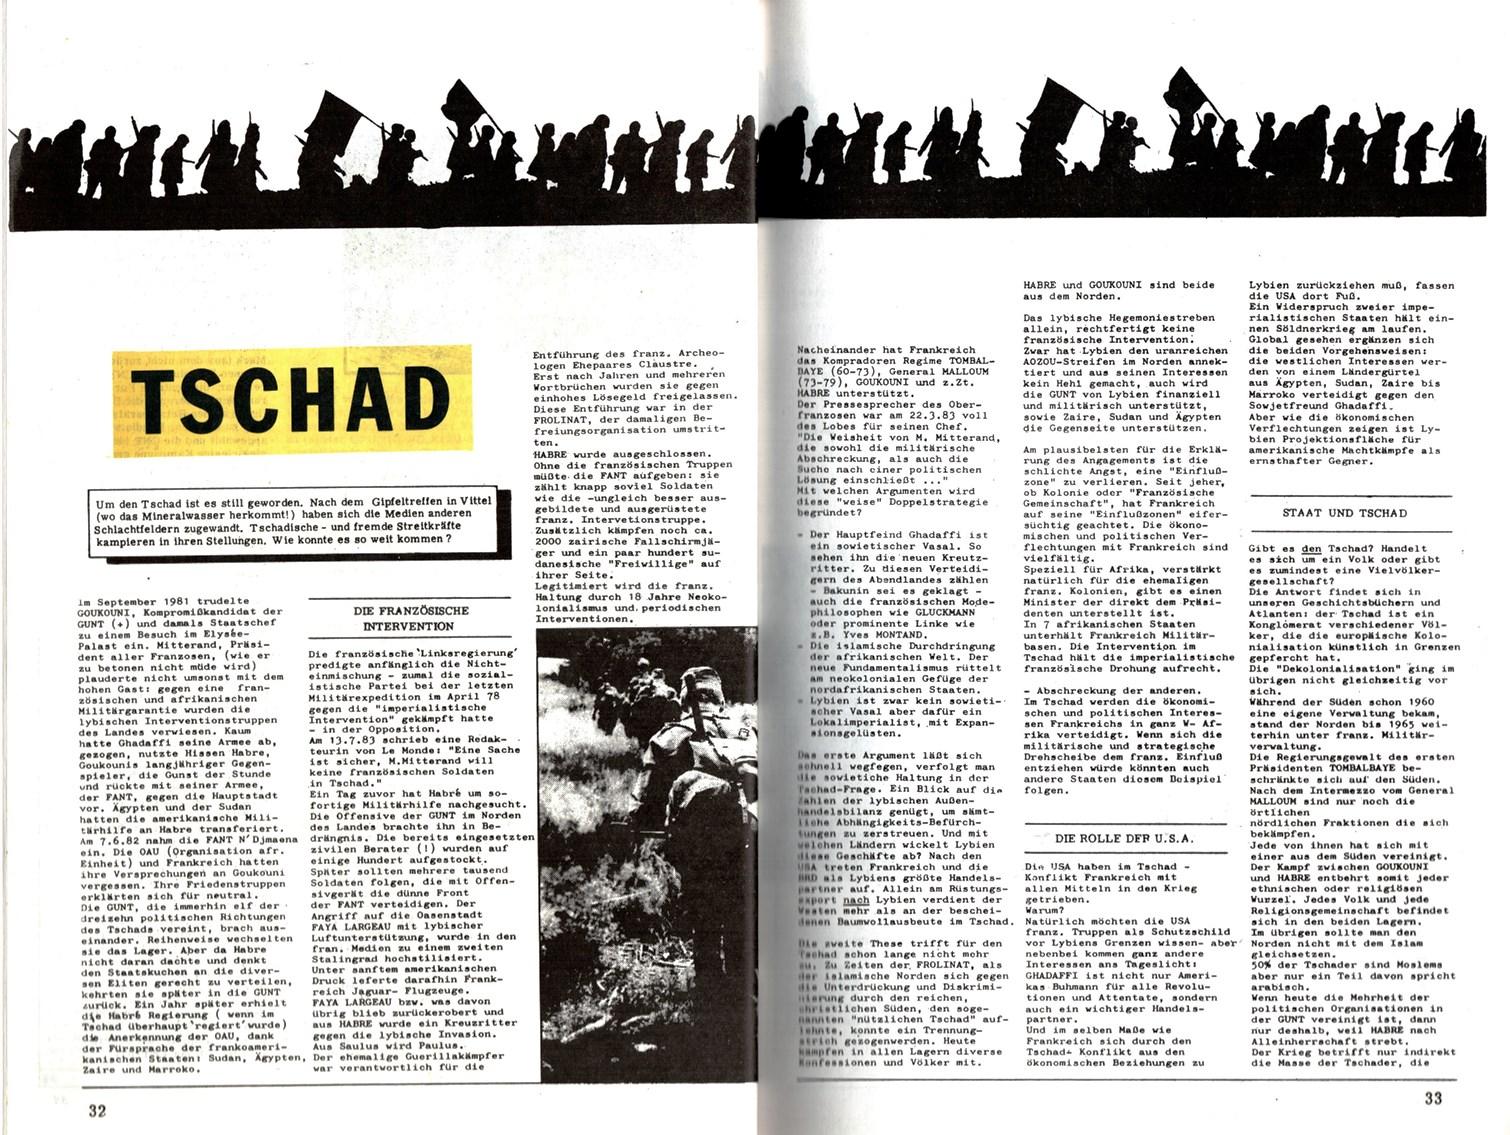 Frankfurt_Aktion_19850200_002_018